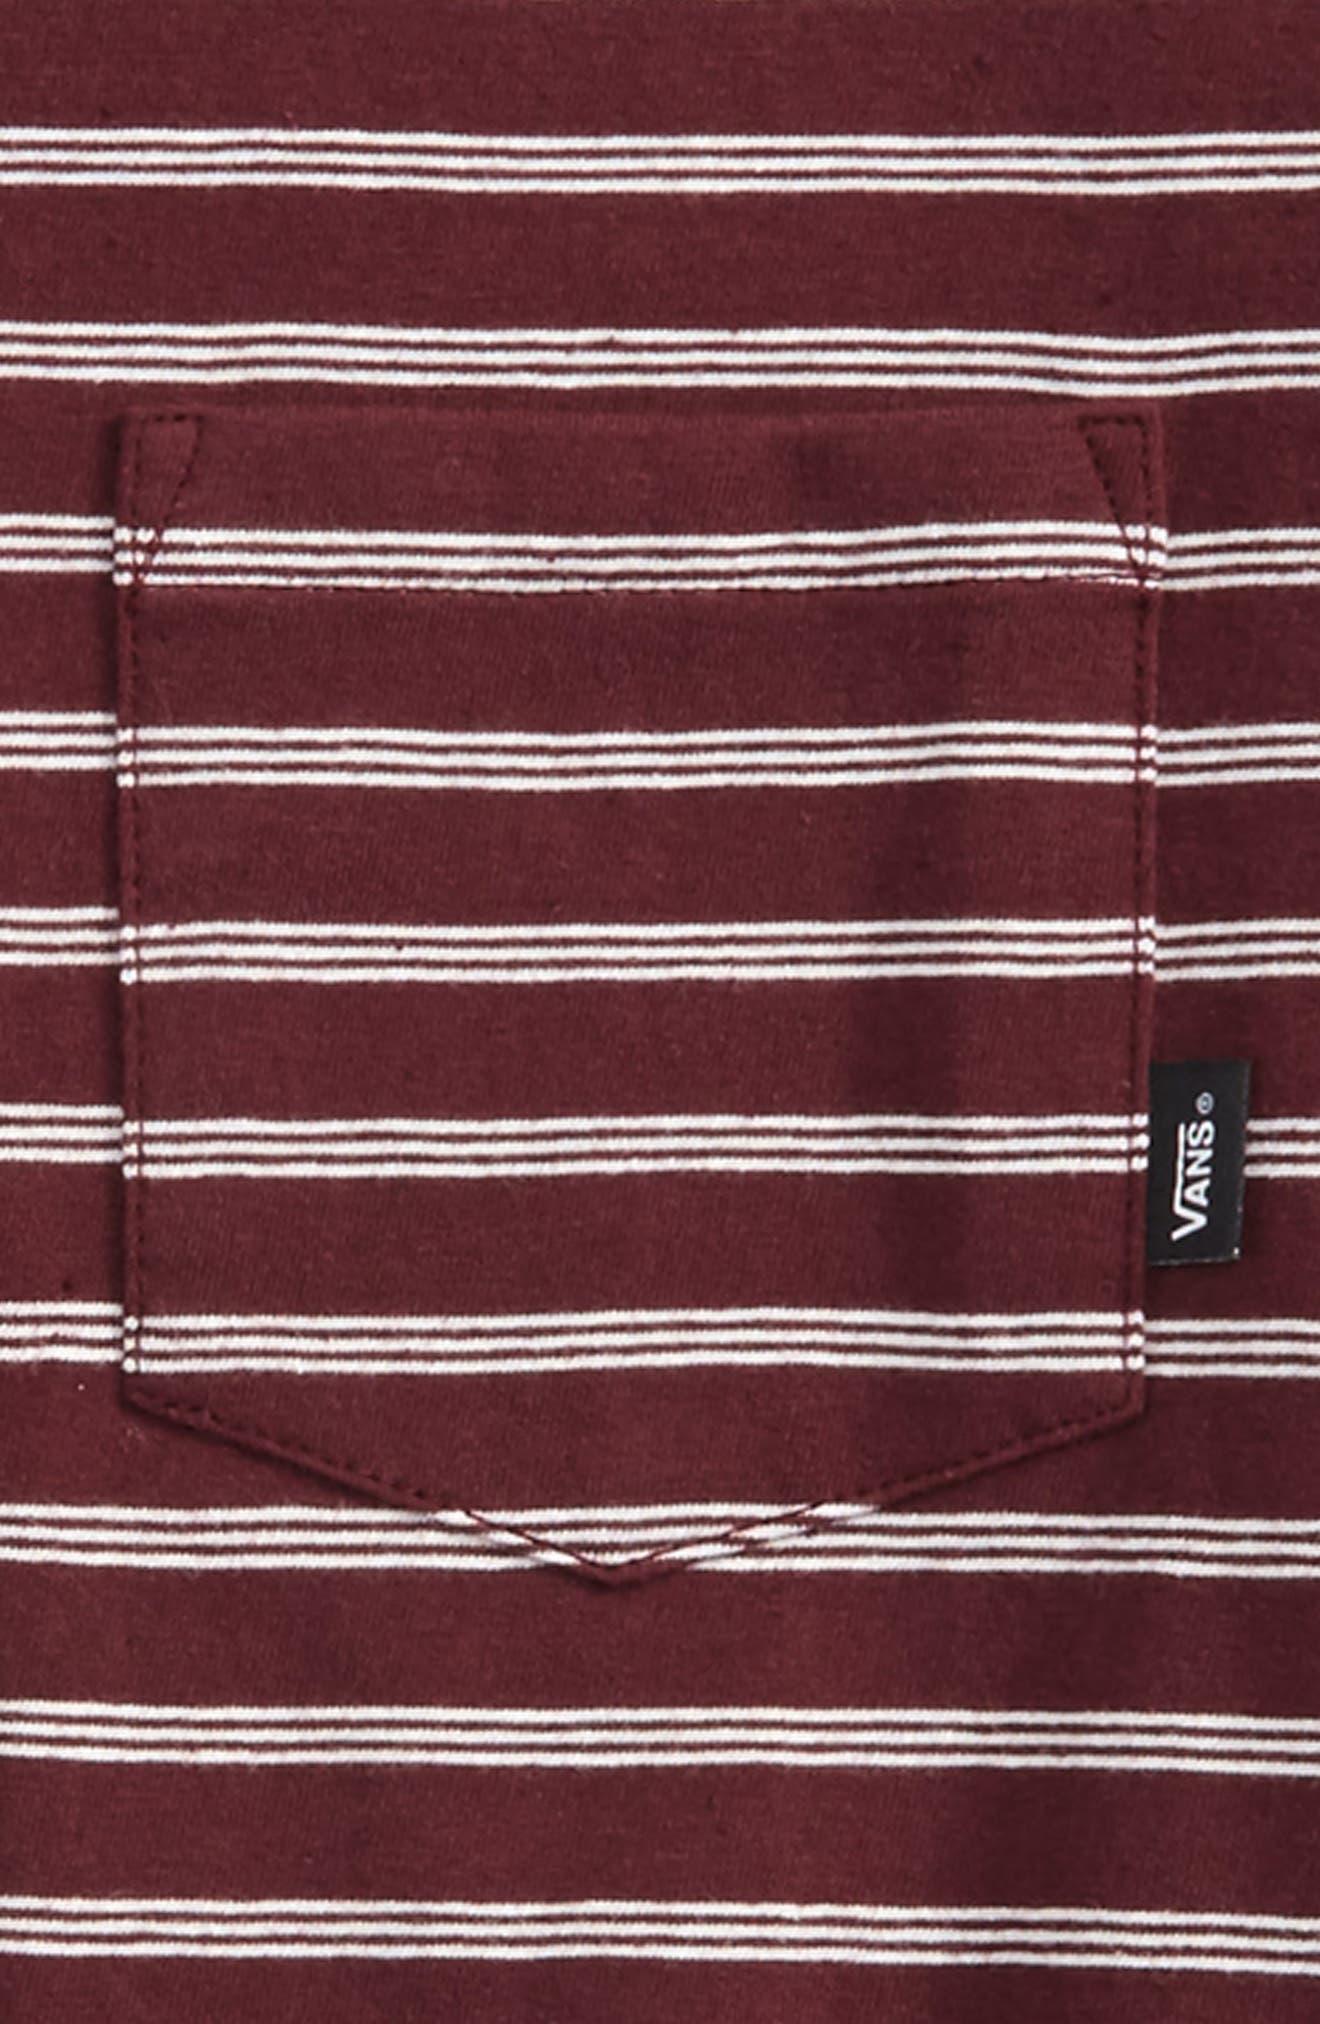 Lined Up Knit T-Shirt,                             Alternate thumbnail 2, color,                             Port Royale